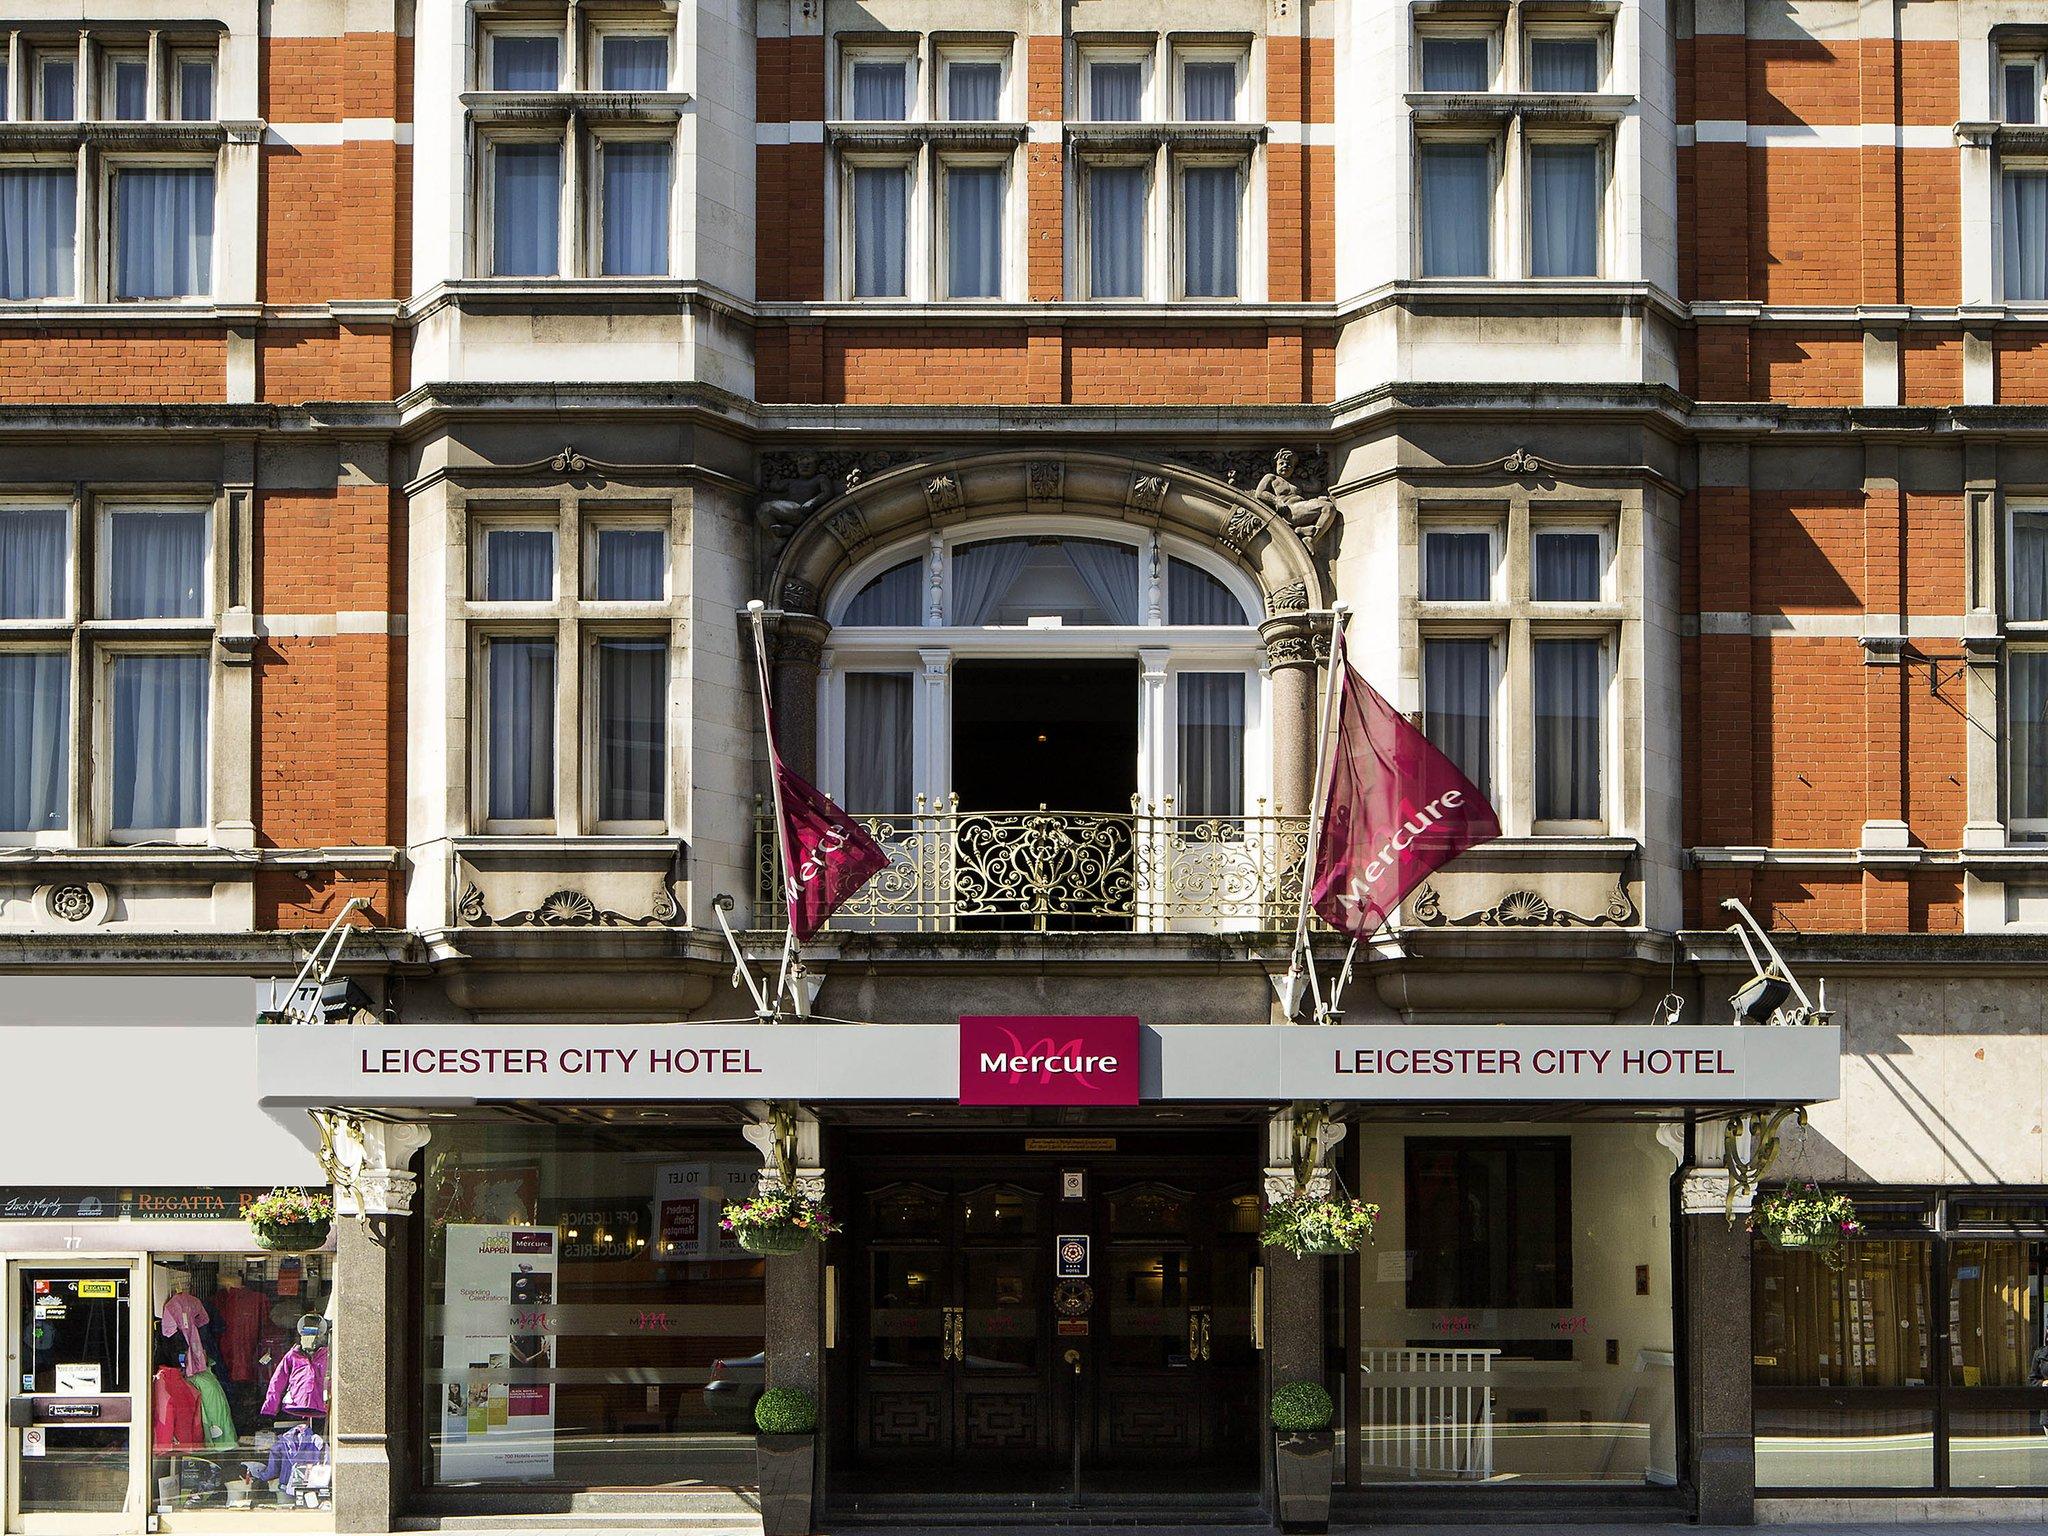 Mercure Leicester City Hotel